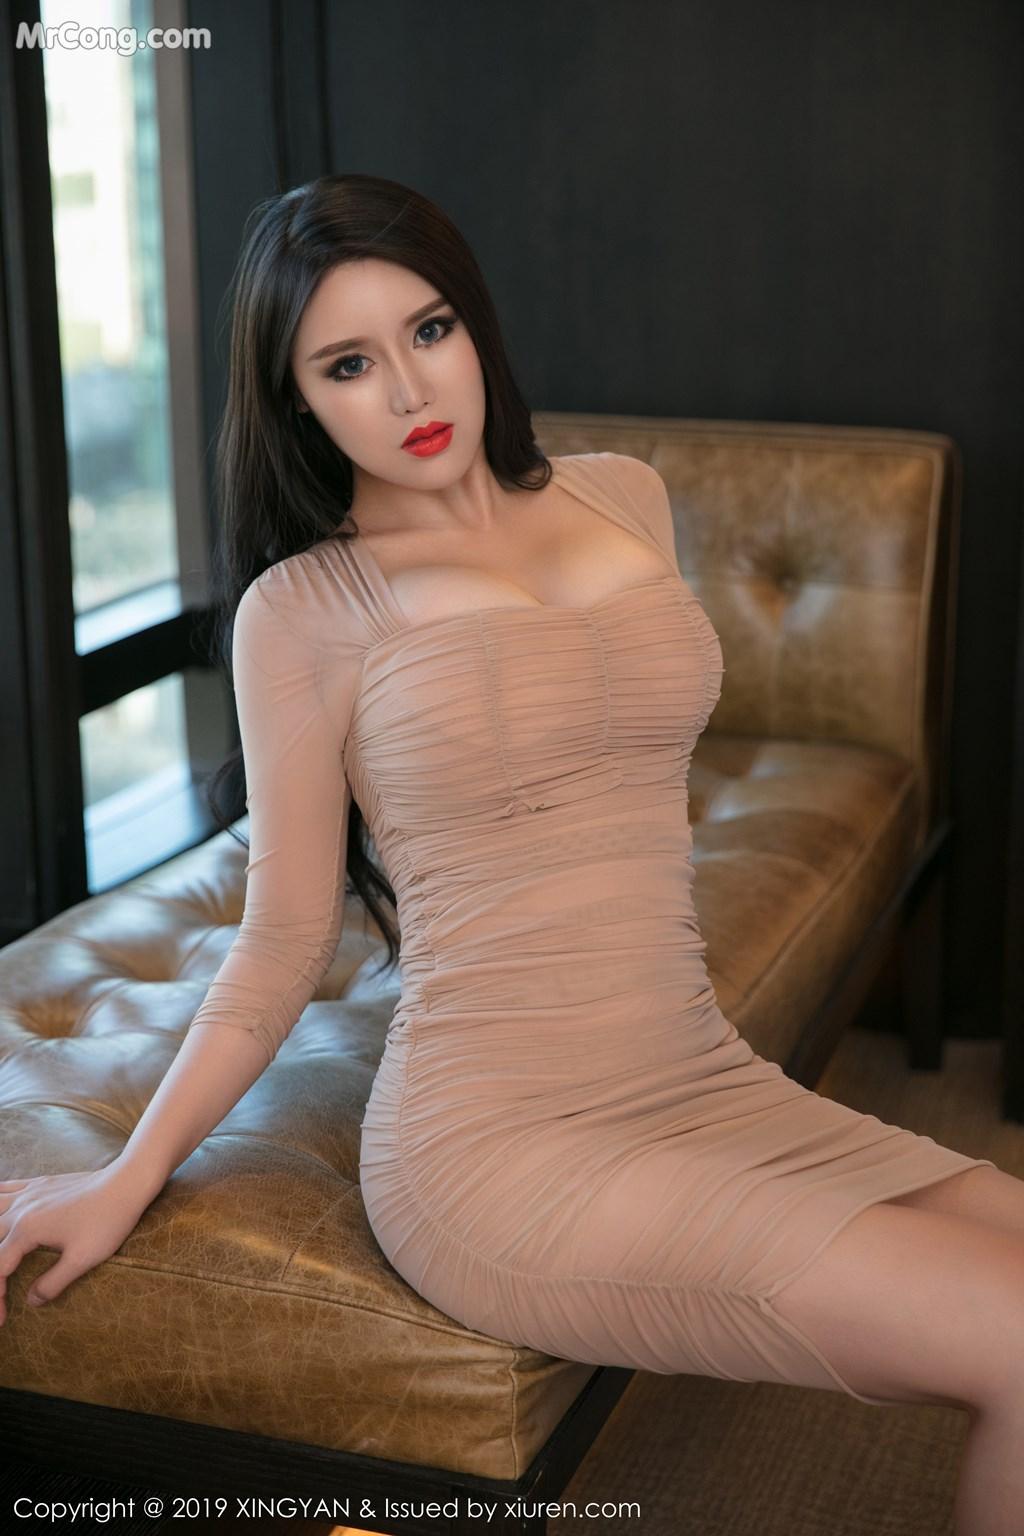 Image XingYan-Vol.111-Ke-Rui-Na-MrCong.com-025 in post XingYan Vol.111: Người mẫu Ke Rui Na (可蕊娜) (52 ảnh)